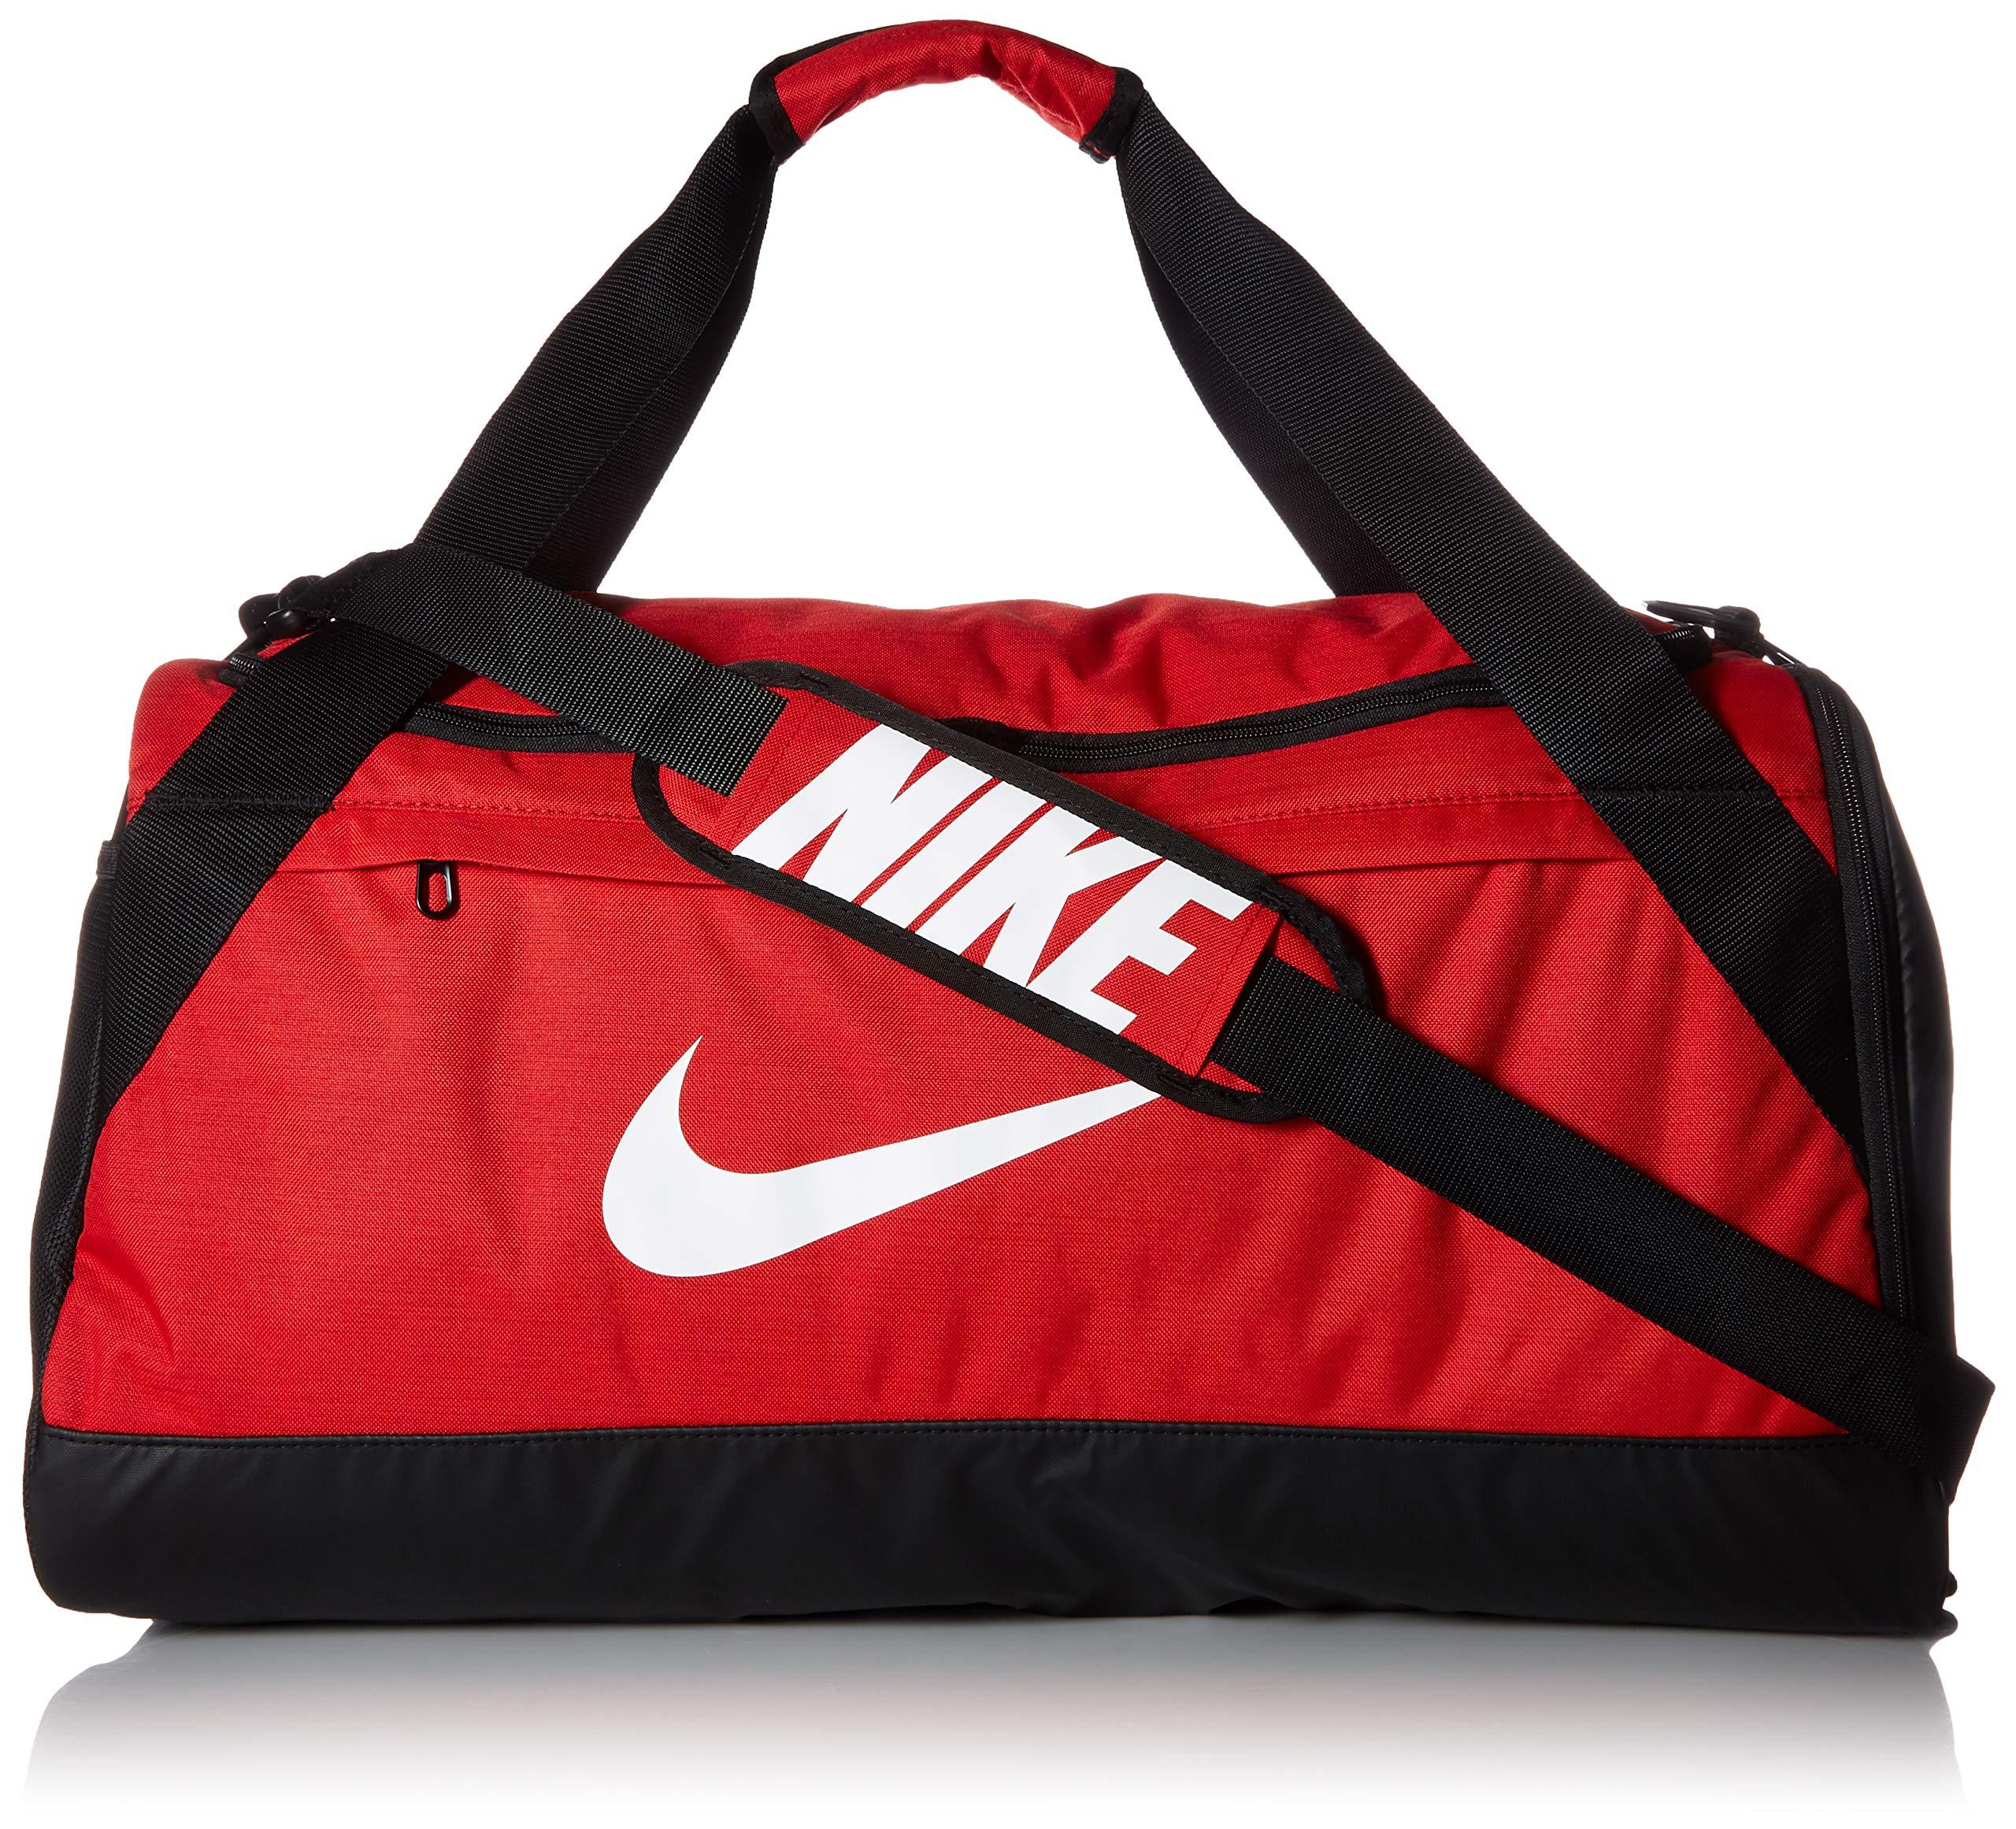 Nike Brasilia Training Duffel Bag, Versatile Bag with Padded Strap and Mesh Exterior Pocket, Medium, University Red/Black/White by Nike